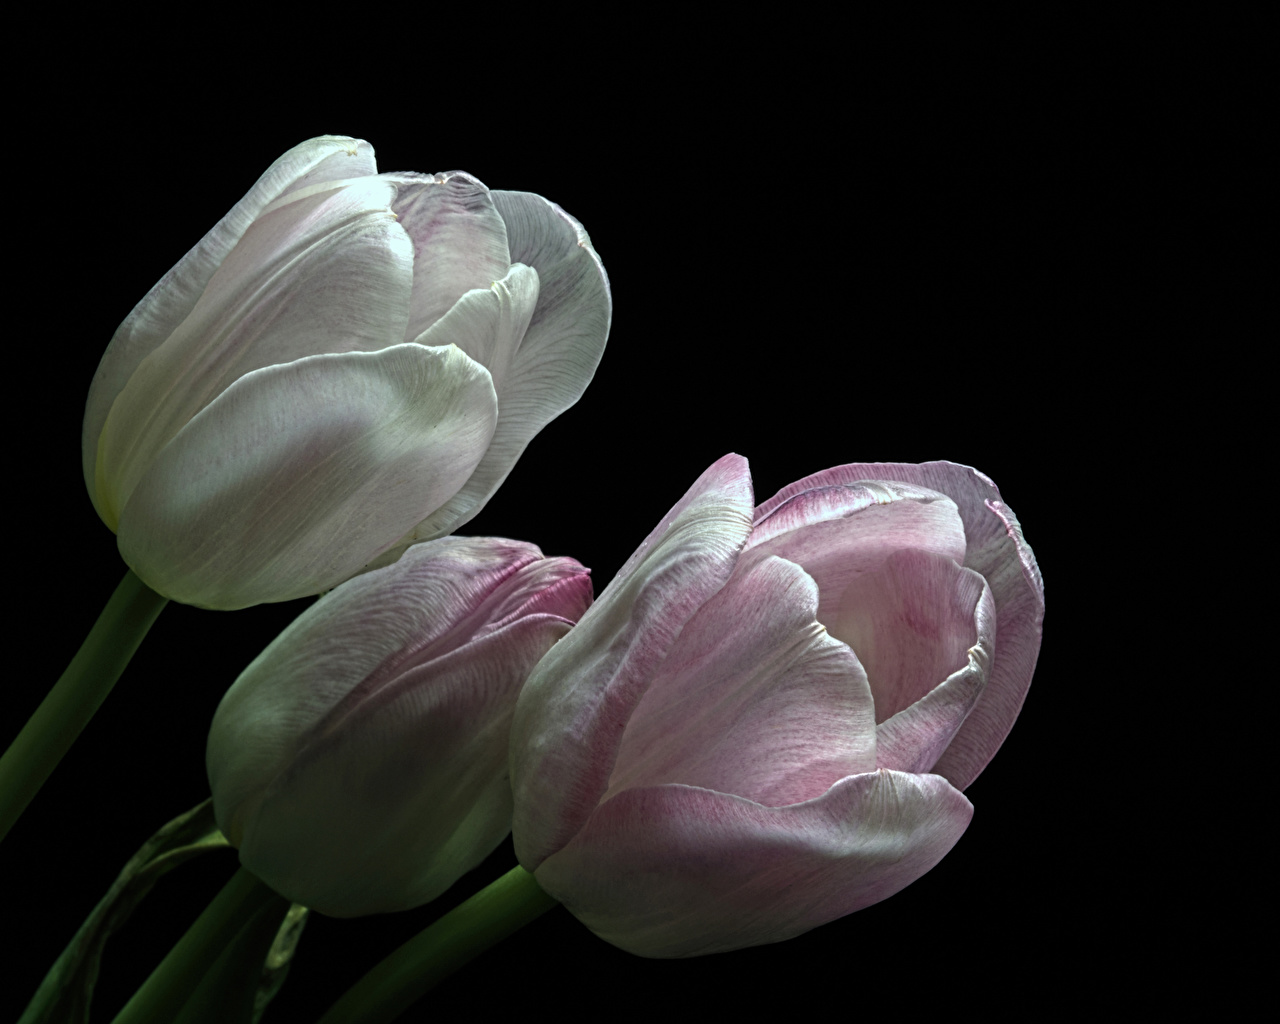 Images tulip flower Three 3 Closeup Black background Tulips Flowers